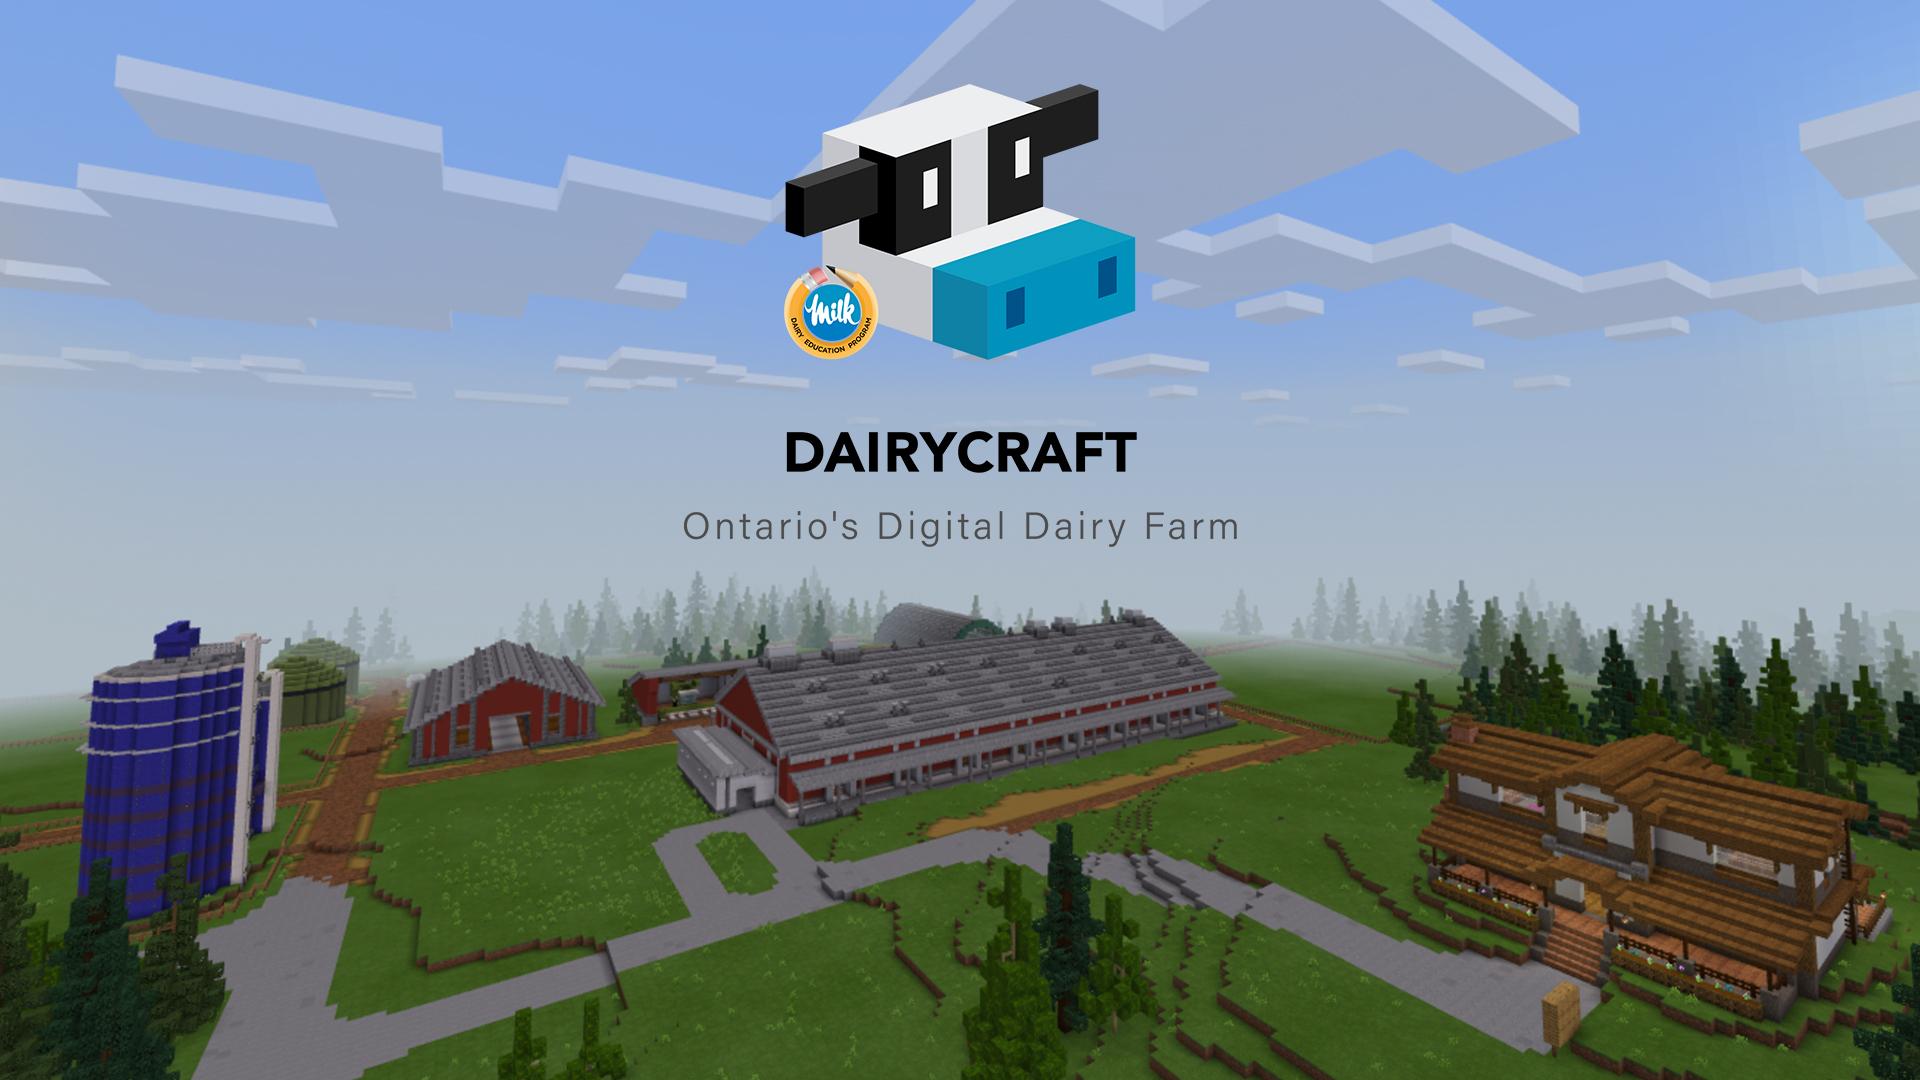 Dairycraft-image